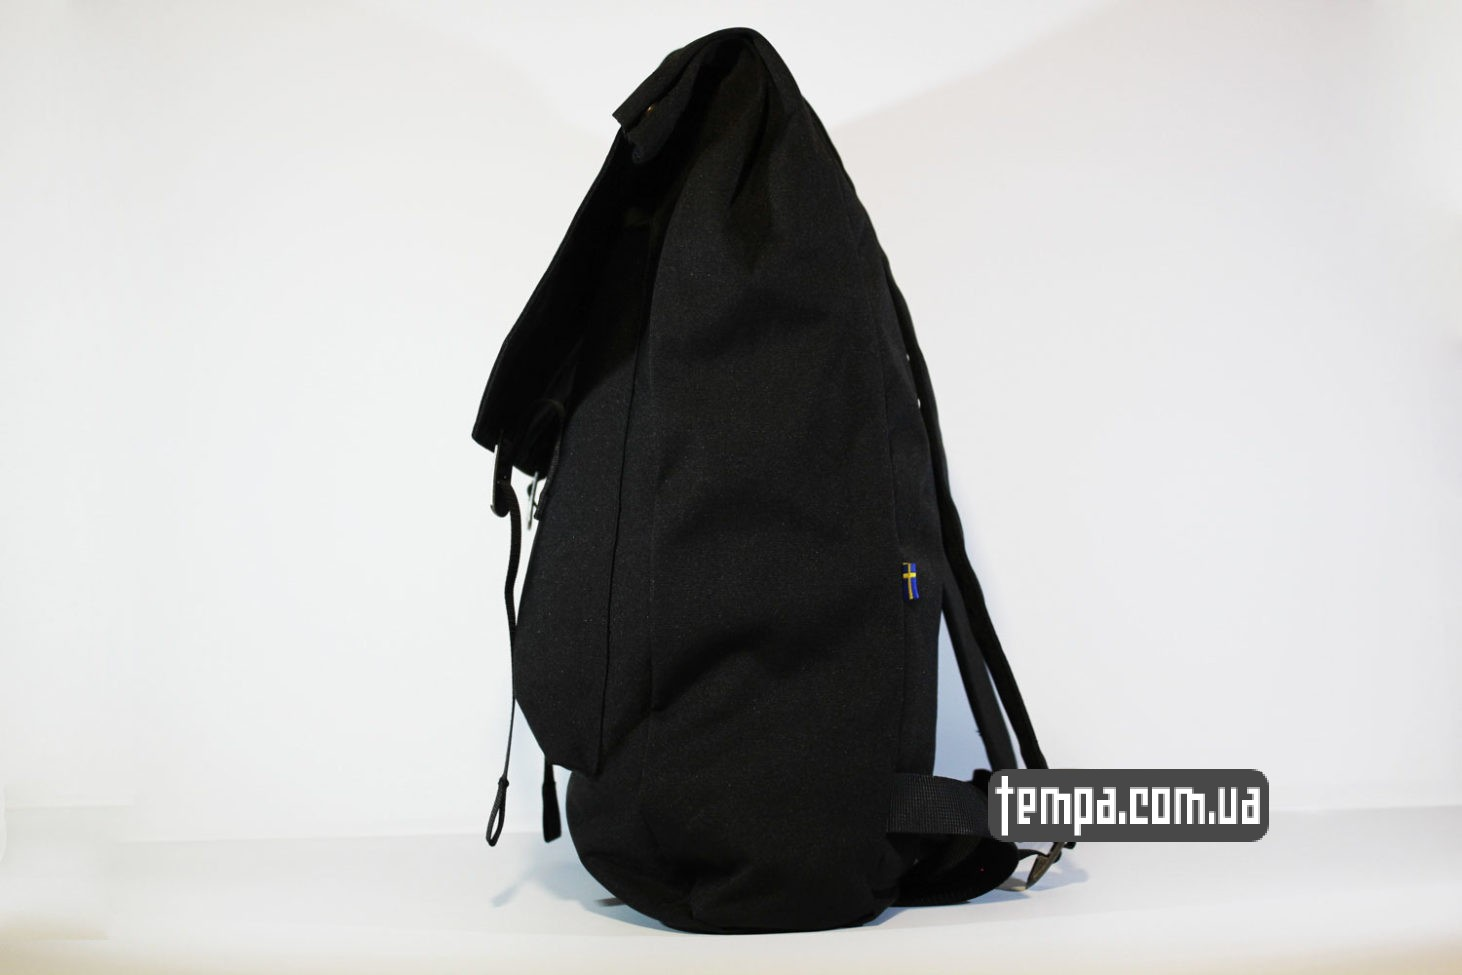 логотип лисы лисчки рюкзак сумка Fjallraven Foldsack No.1 Backpack черный